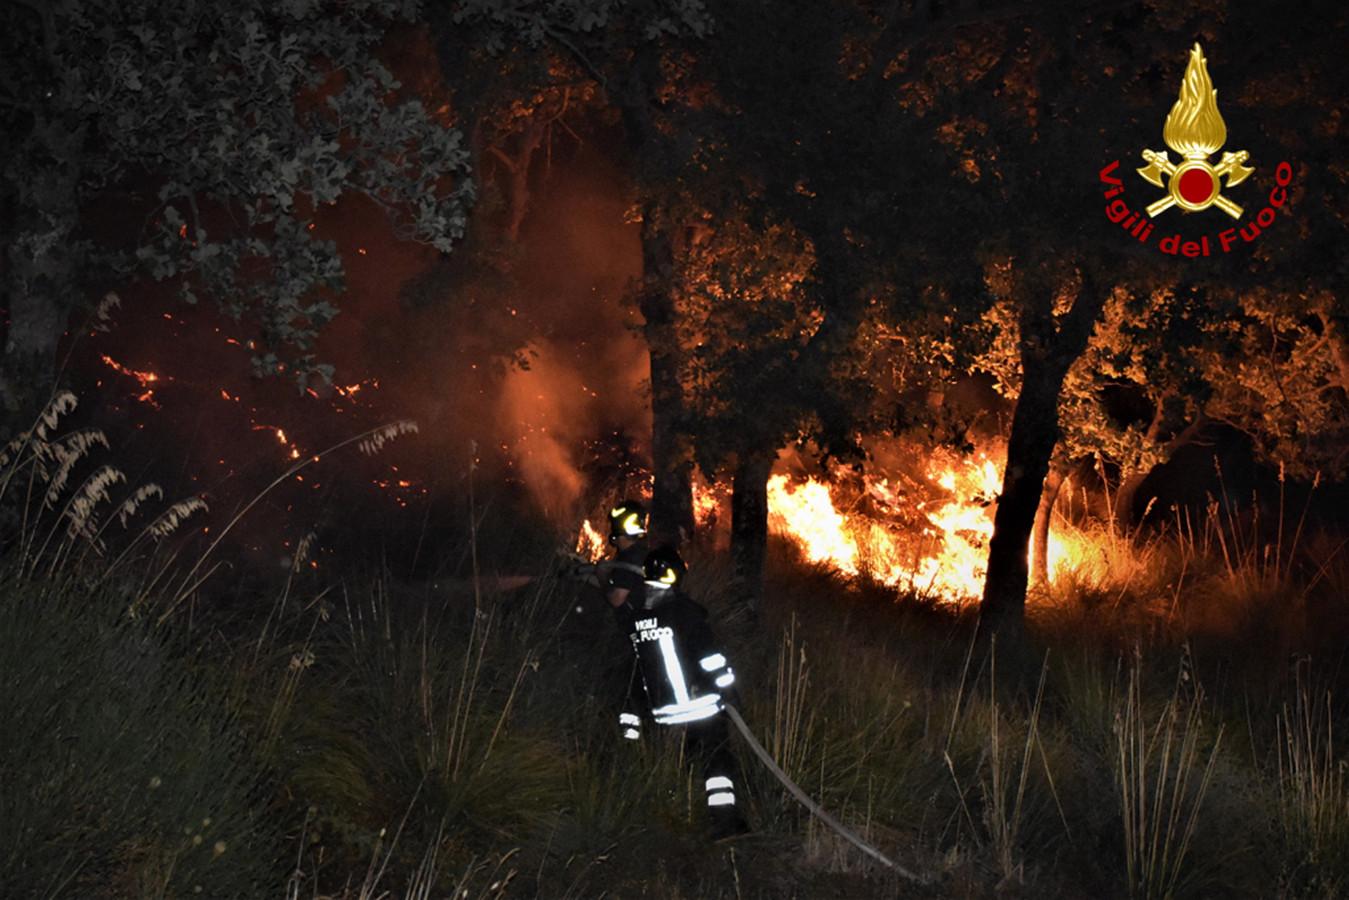 Brandweer bestrijdt het vuur in Sicilië.